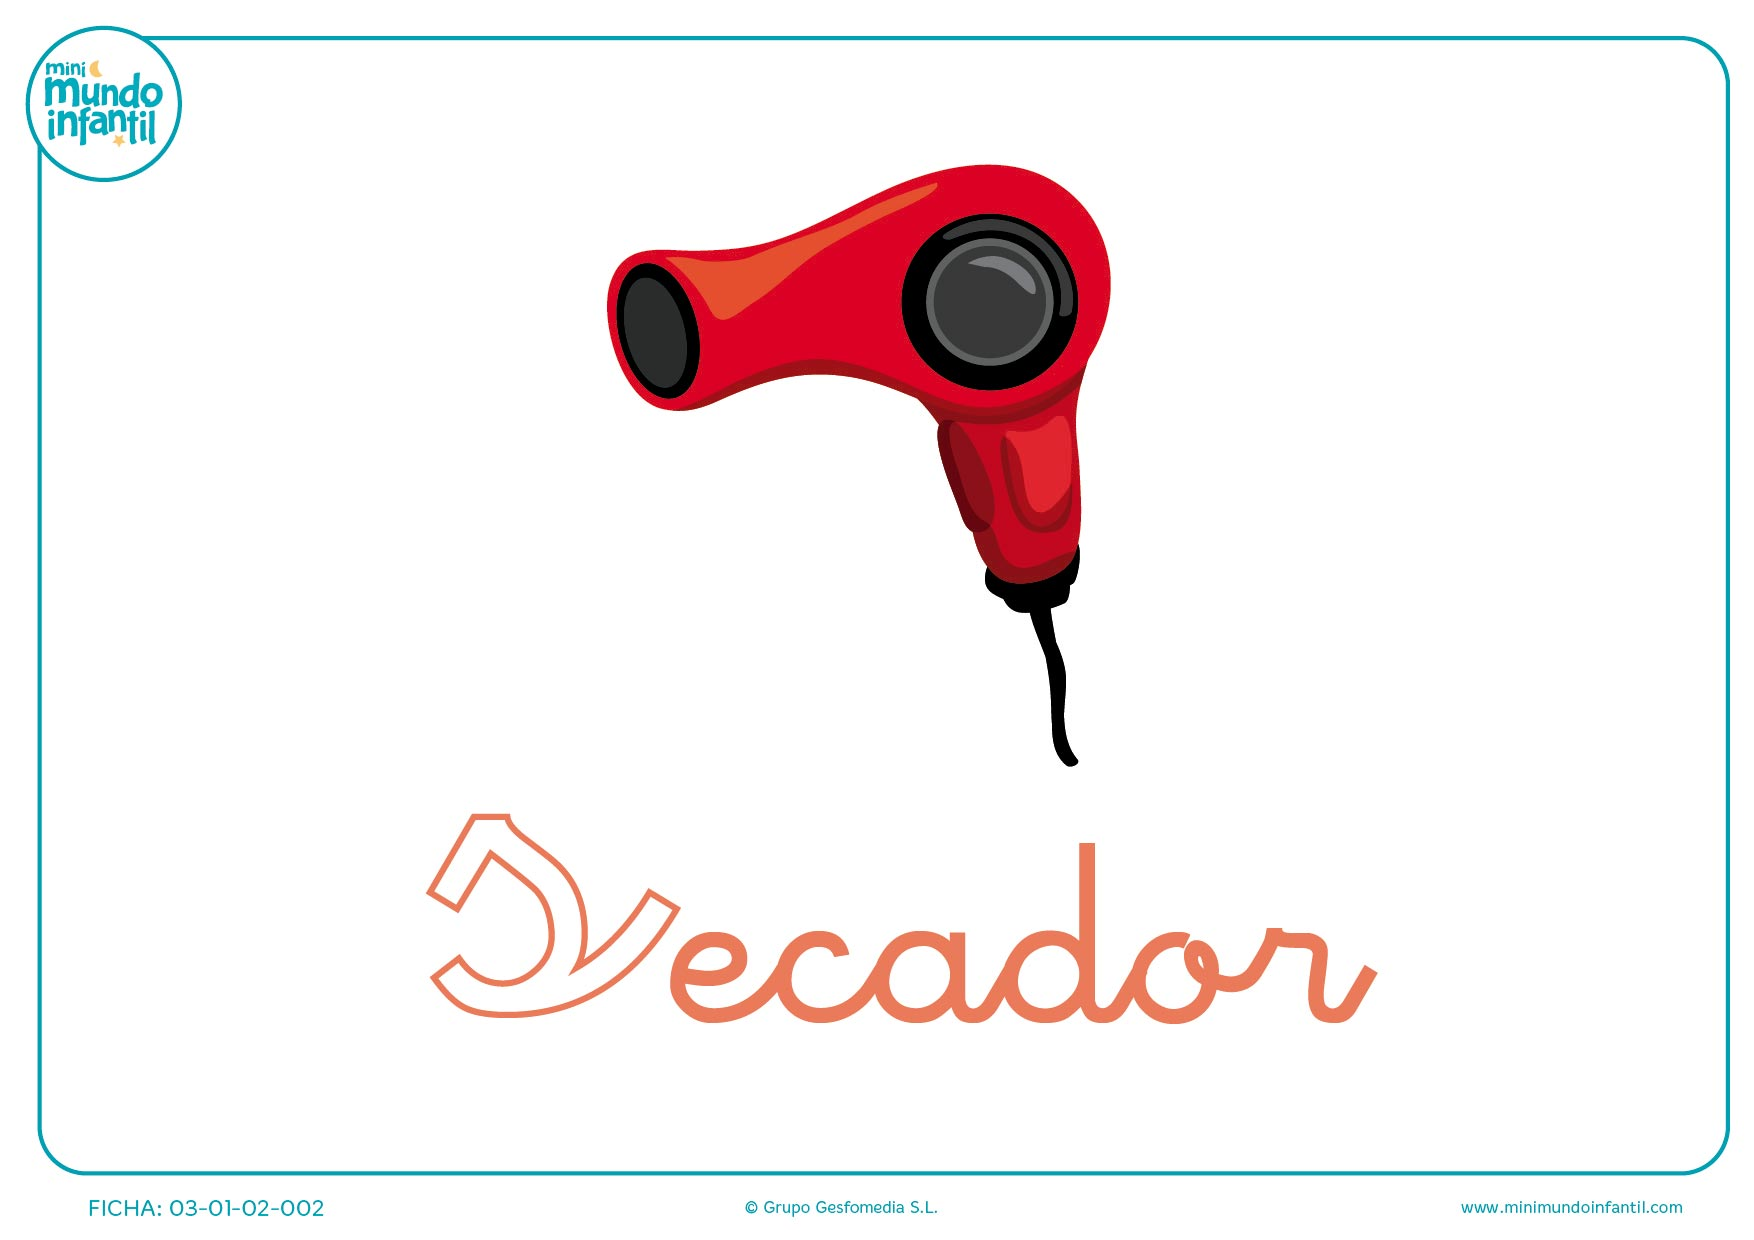 Colorear la letra S minúscula de secador